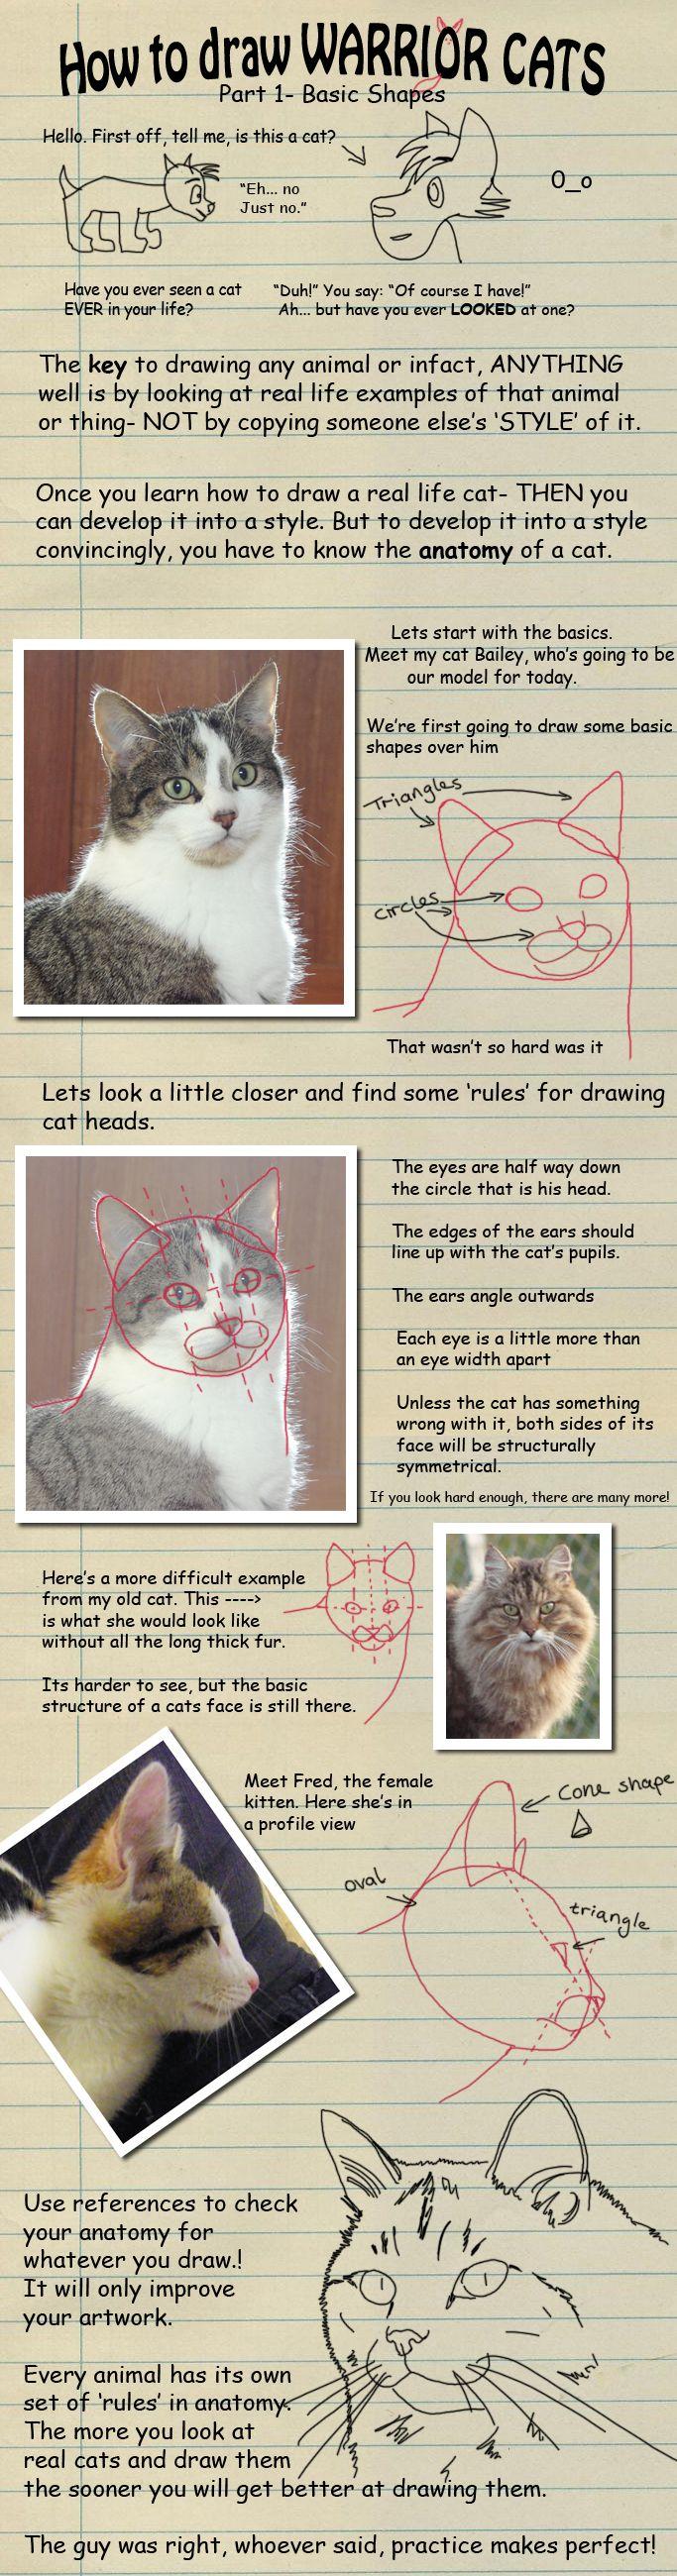 How to draw Warrior Cats pt 1 by *heylorlass on deviantART | Art ...